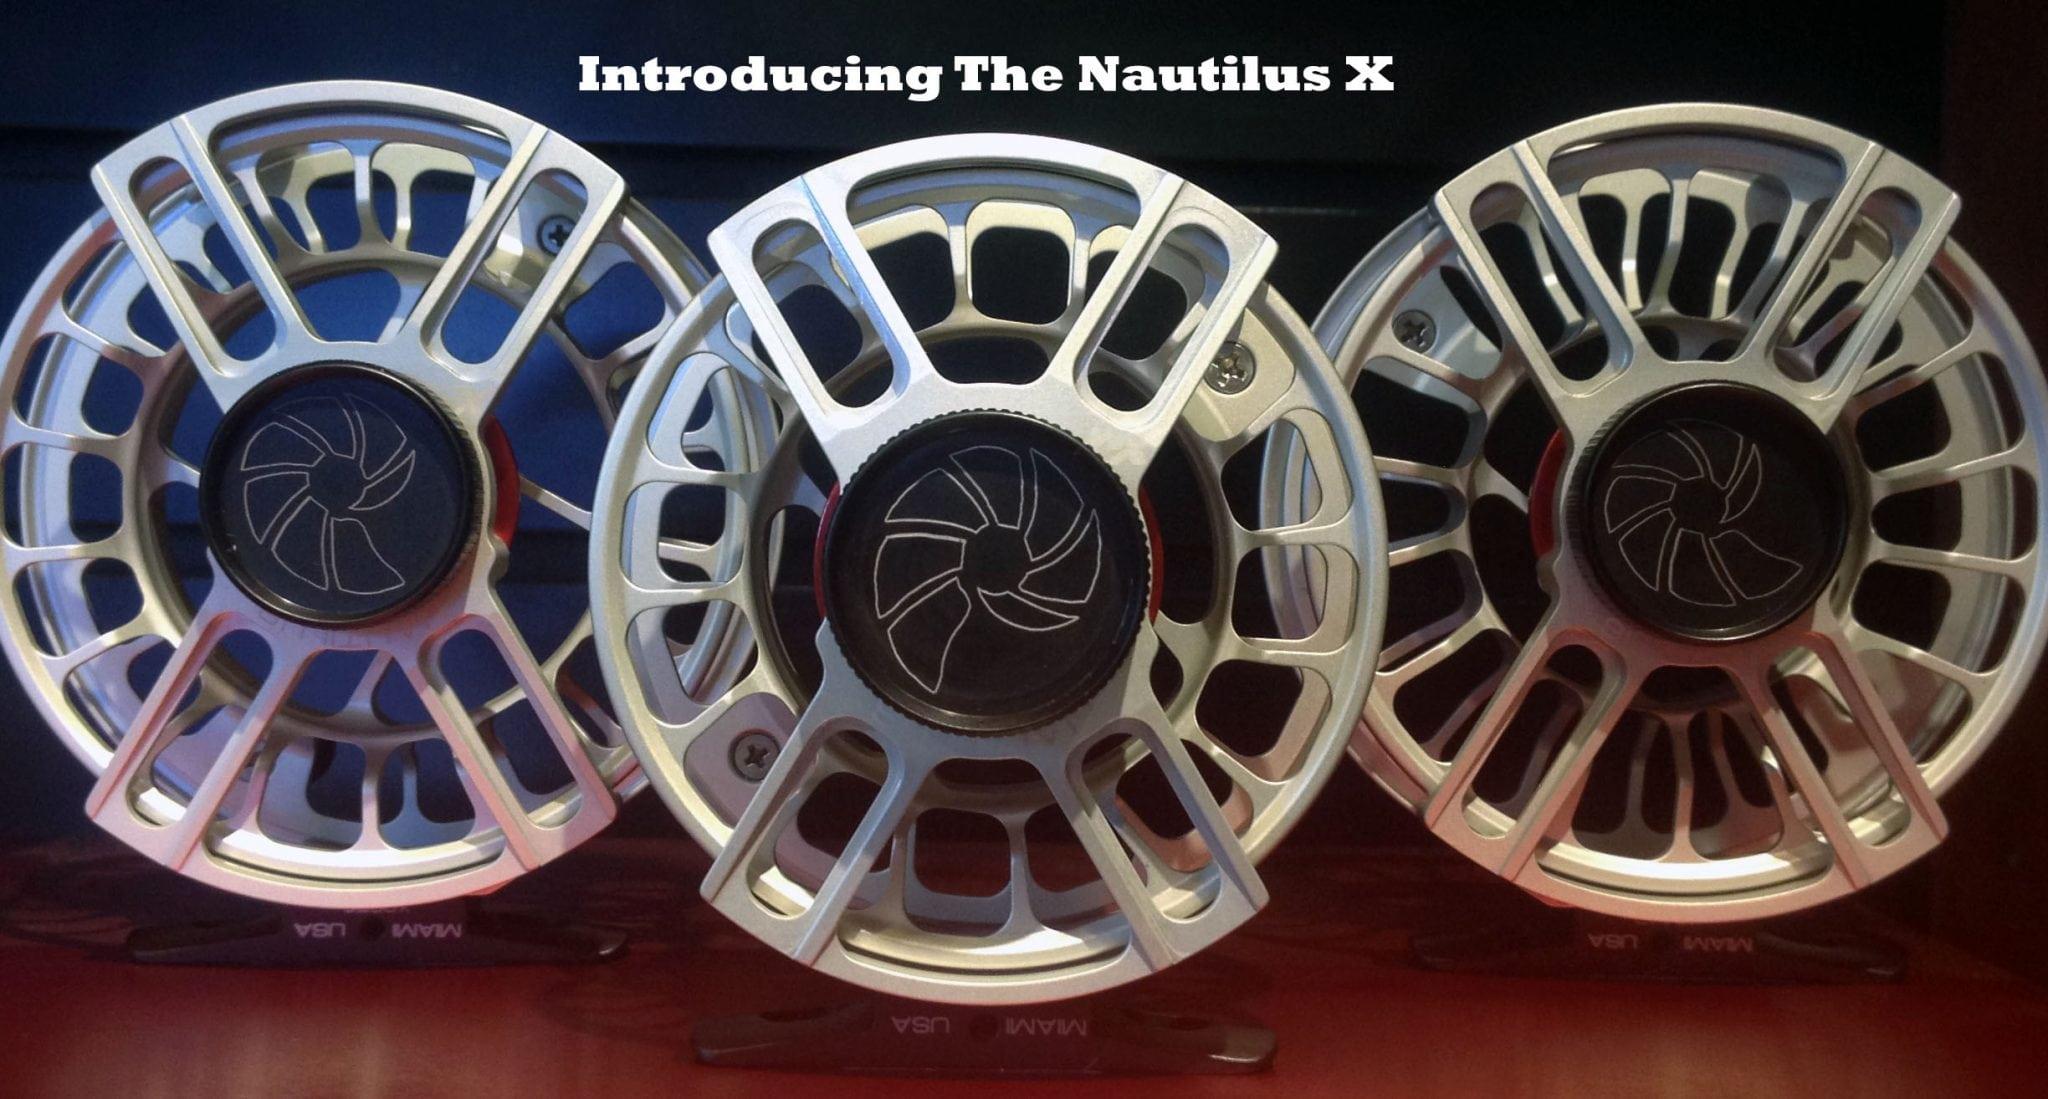 Nautilus_X_Reel